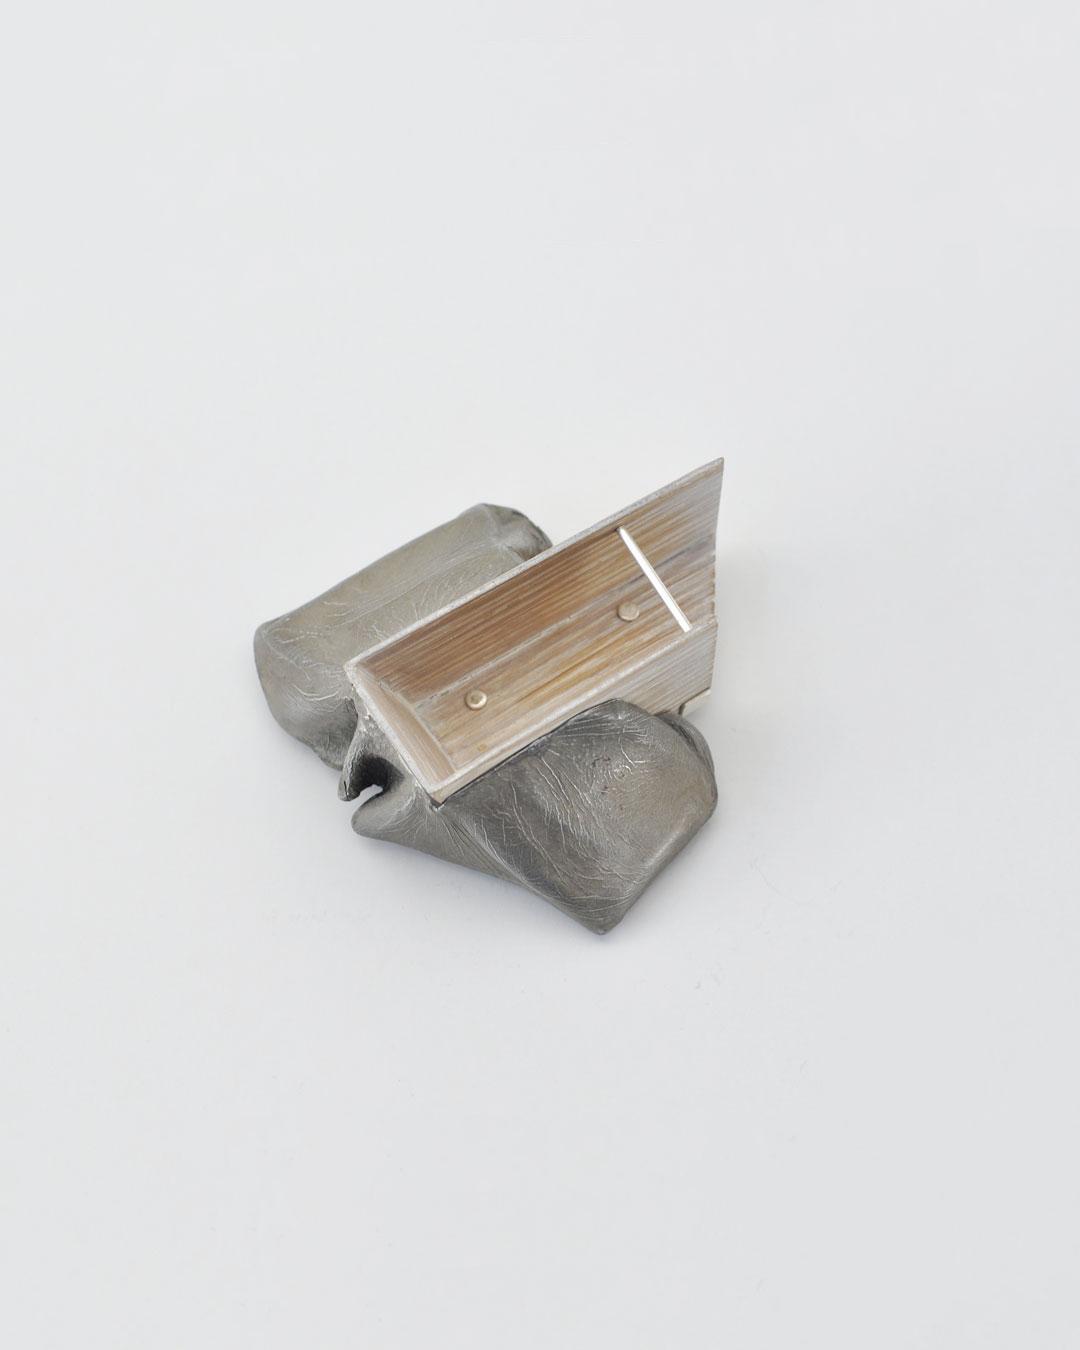 Anders Ljungberg, Declaration #5, 2019, brooch; aluminium, laminated oak, steel, silver, 112 x 113 x 35 mm, €920